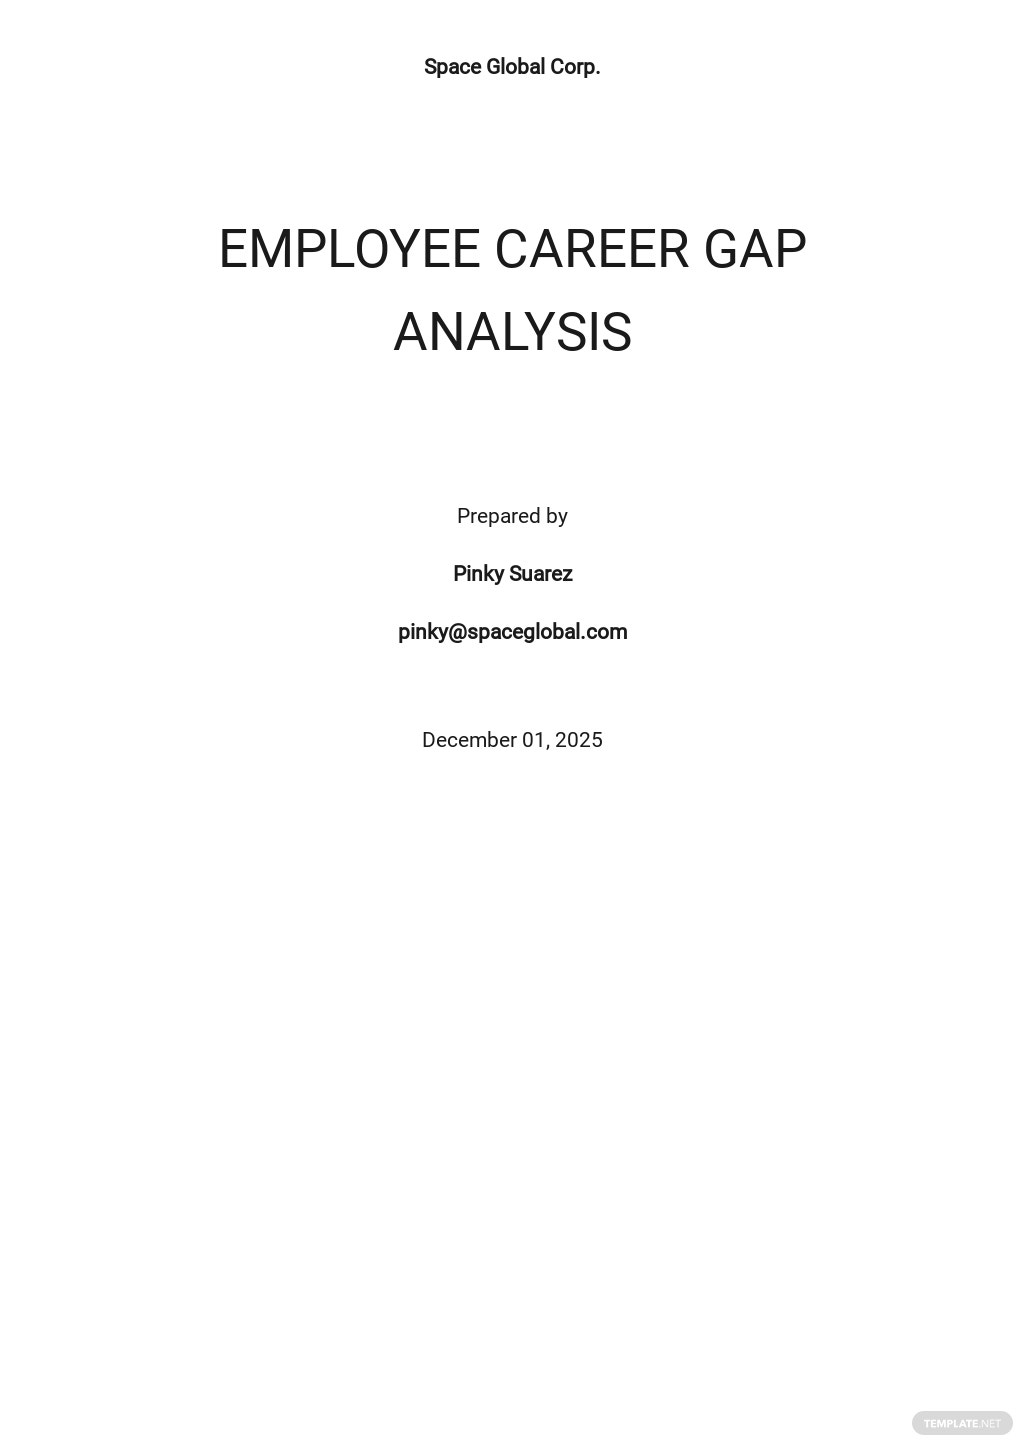 Career Gap Analysis Template.jpe